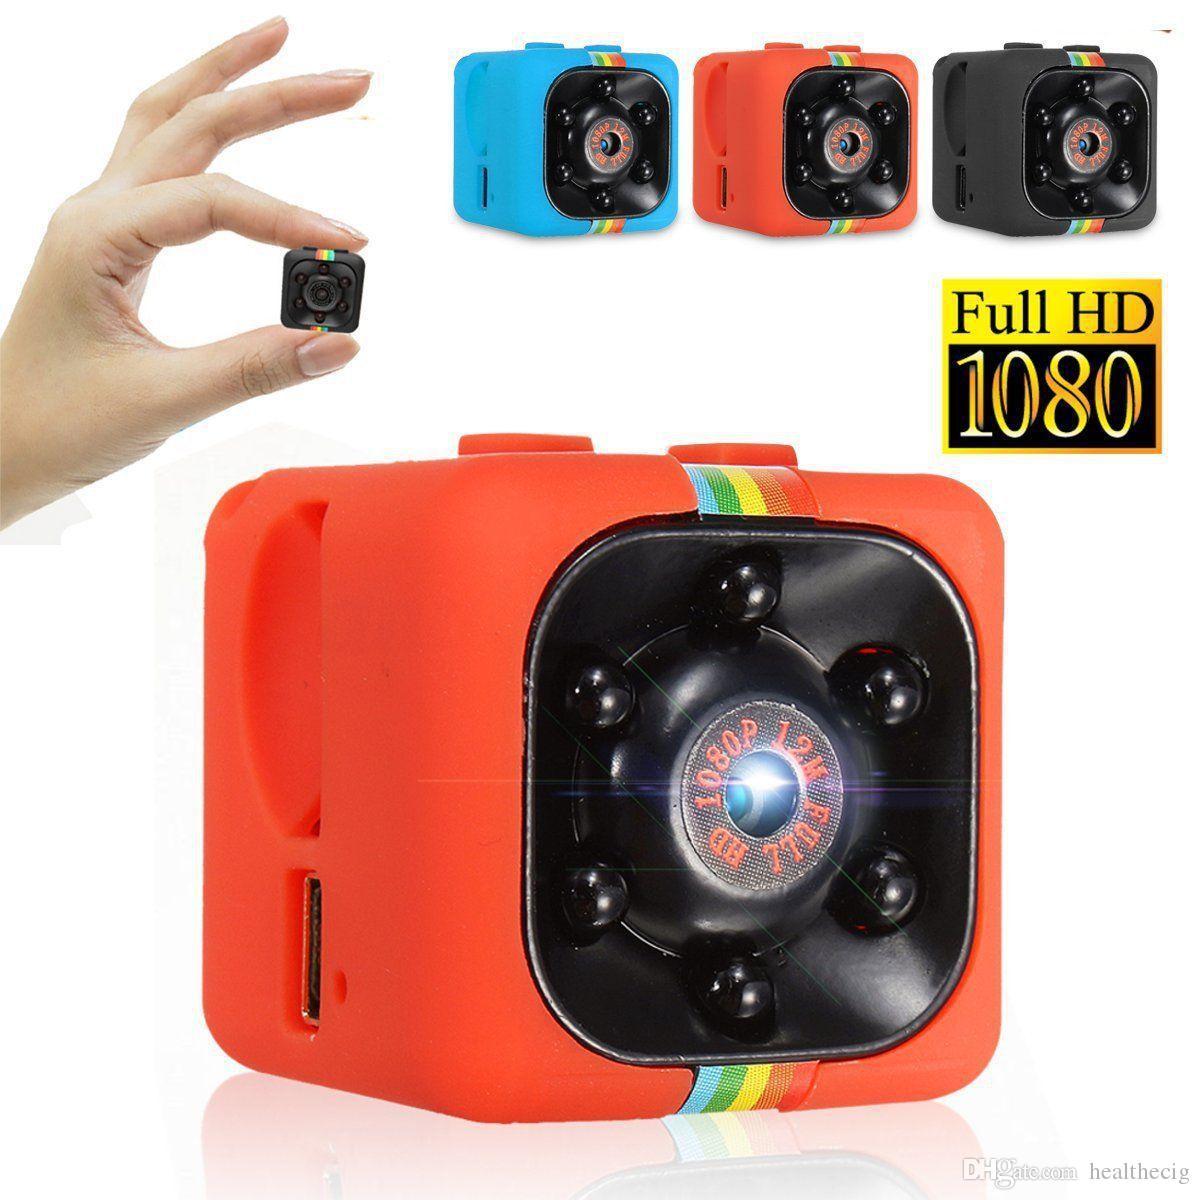 SQ11 SQ8 كاميرا مصغرة كاملة HD 1080P للرؤية الليلية كاميرا مصغرة عمل كاميرا فيديو DV تسجيل صوتي مايكرو كاميرا حرية الملاحة